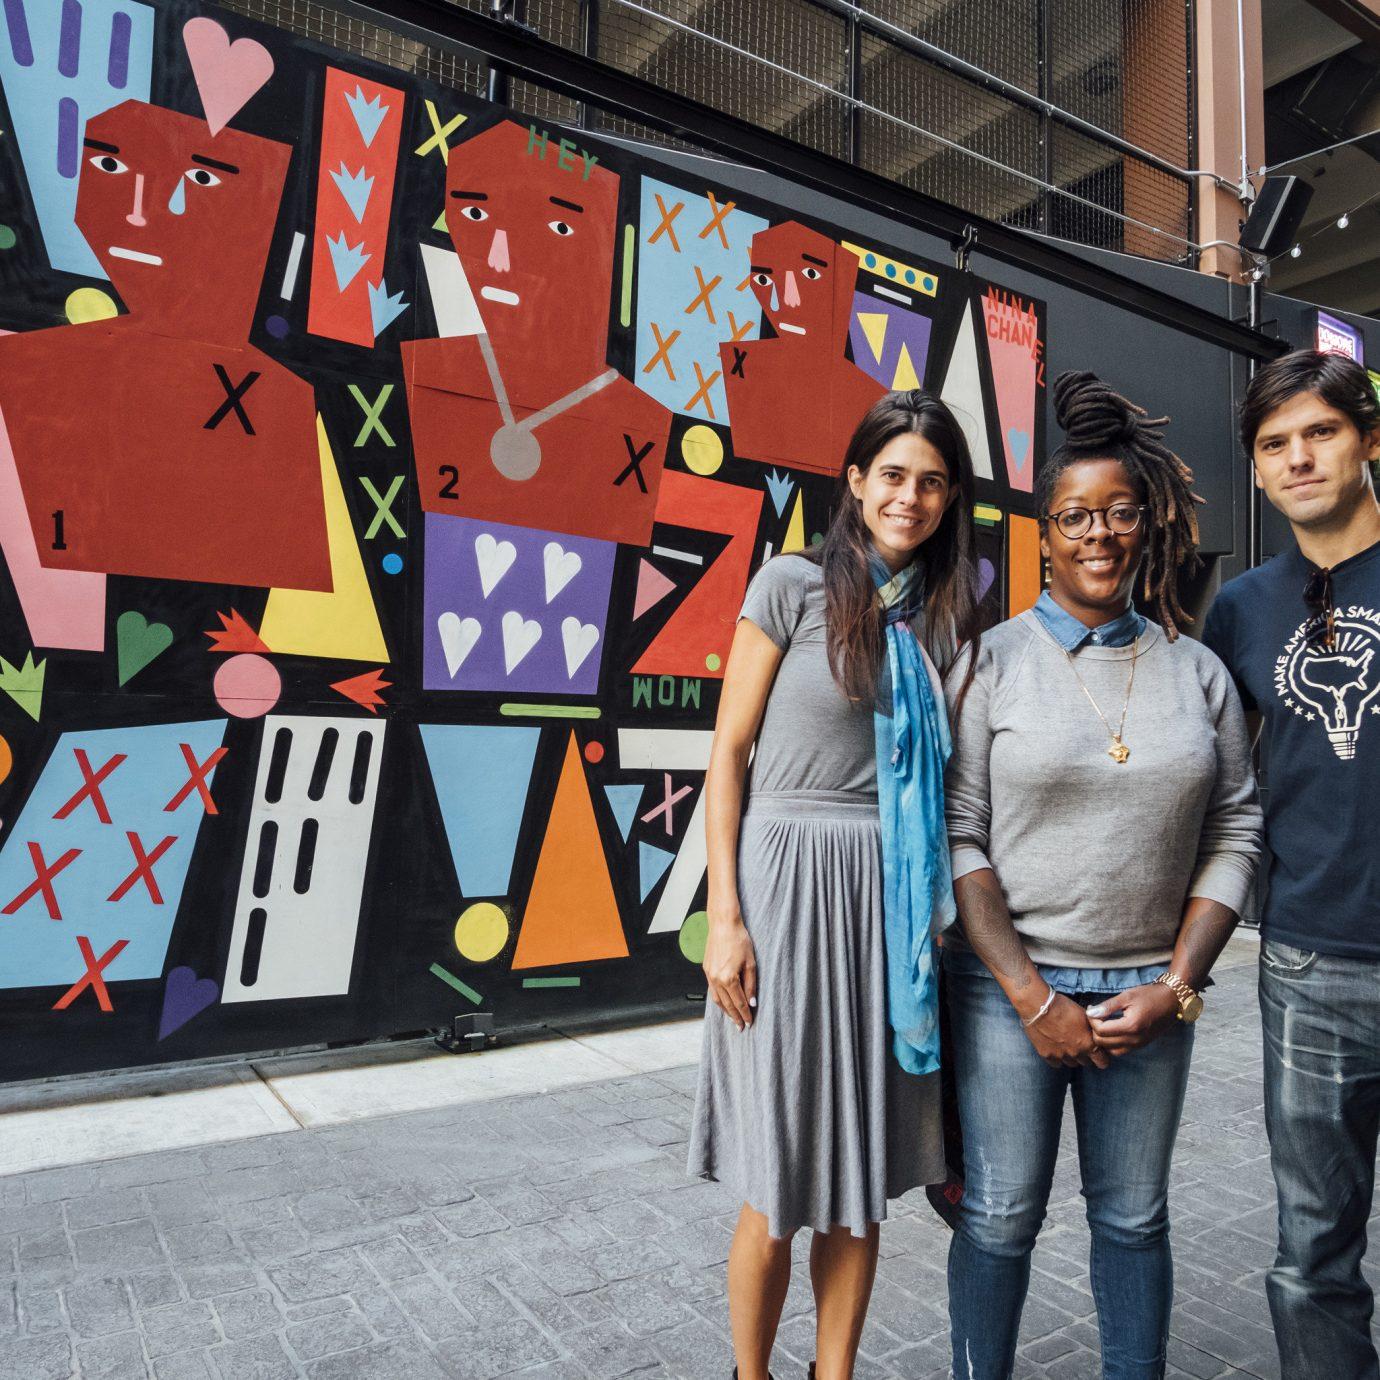 Detroit Influencers + Tastemakers Trip Ideas mural street art street art product